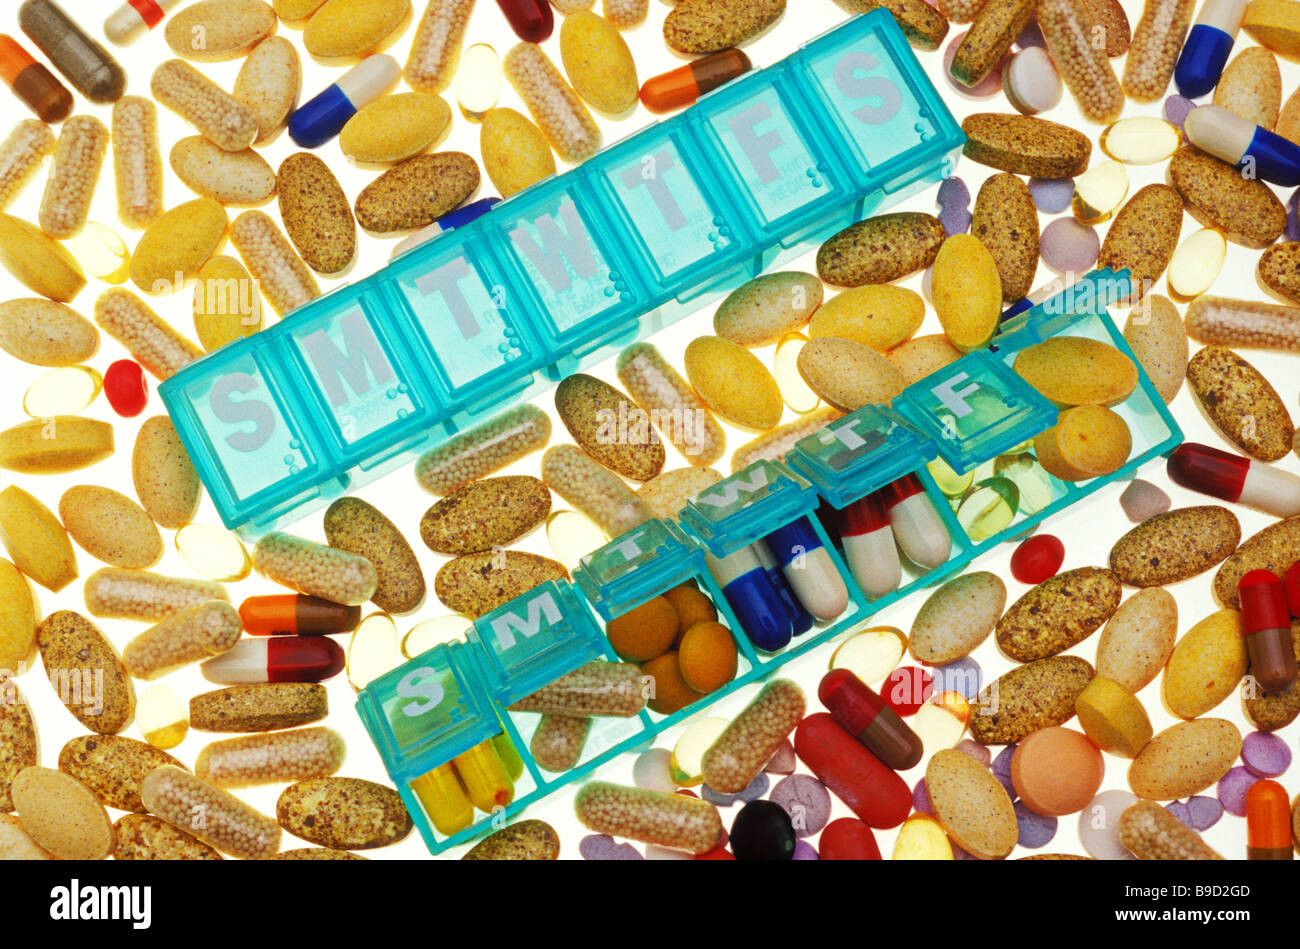 Recreational Drugs Pills Stock Photos & Recreational Drugs